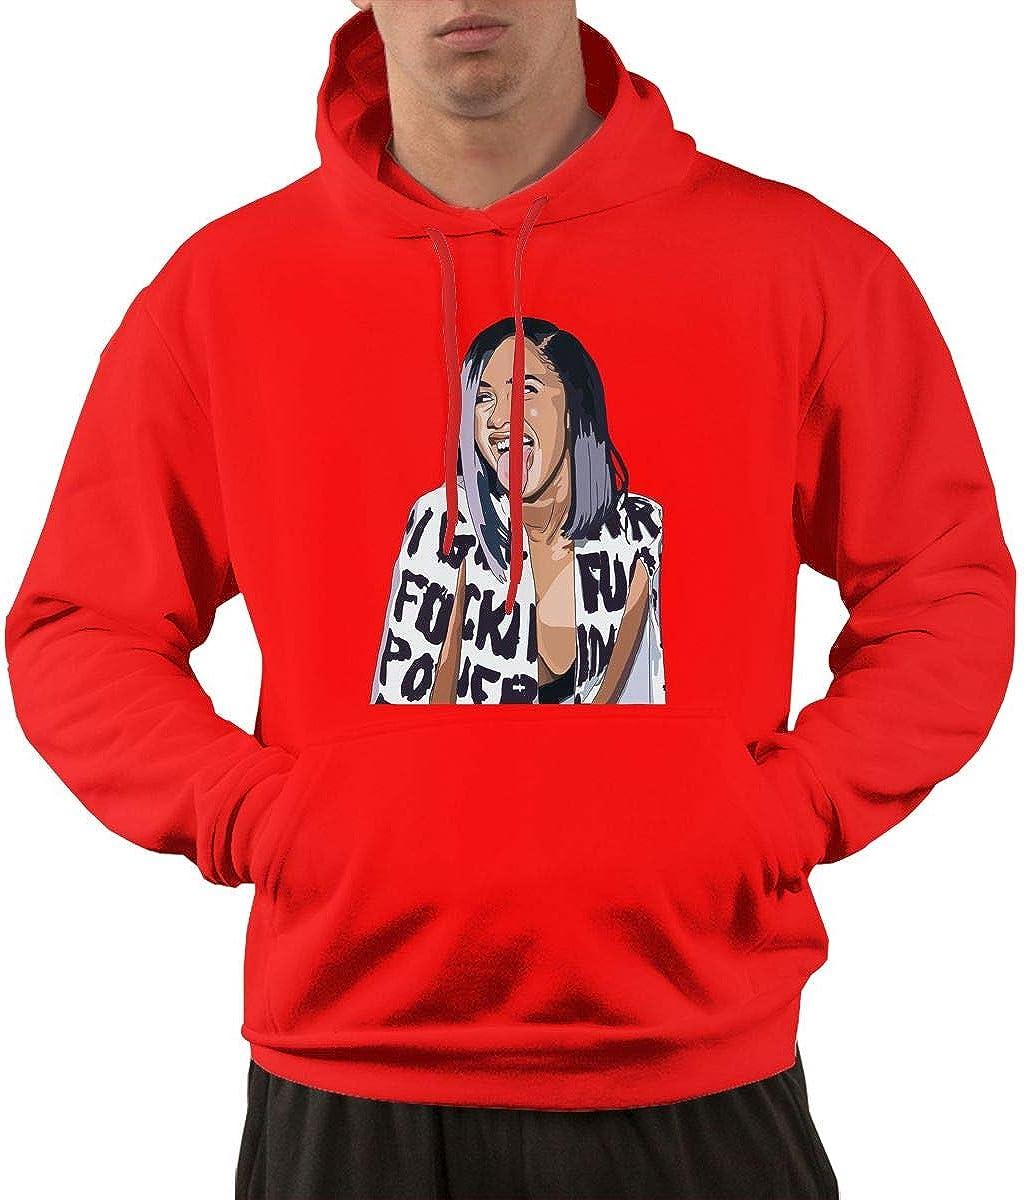 JEEZORN Fashion Rap Critic Reviews Cardi B Bodak Yellow Sweater for Men Black